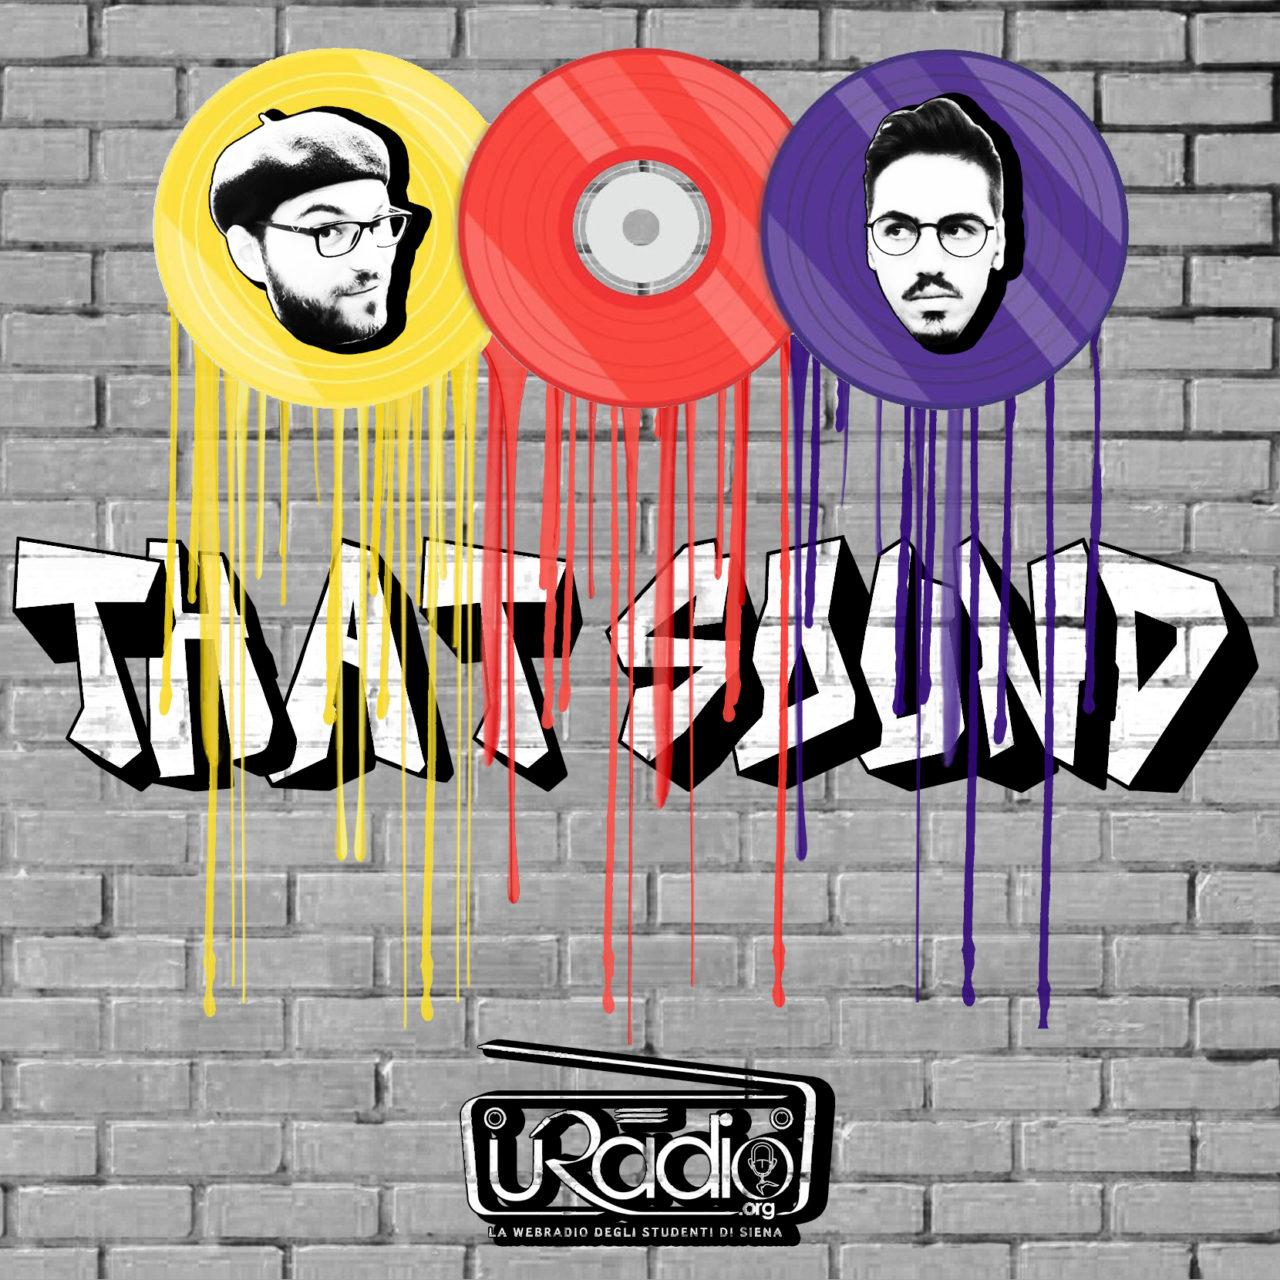 thatsound